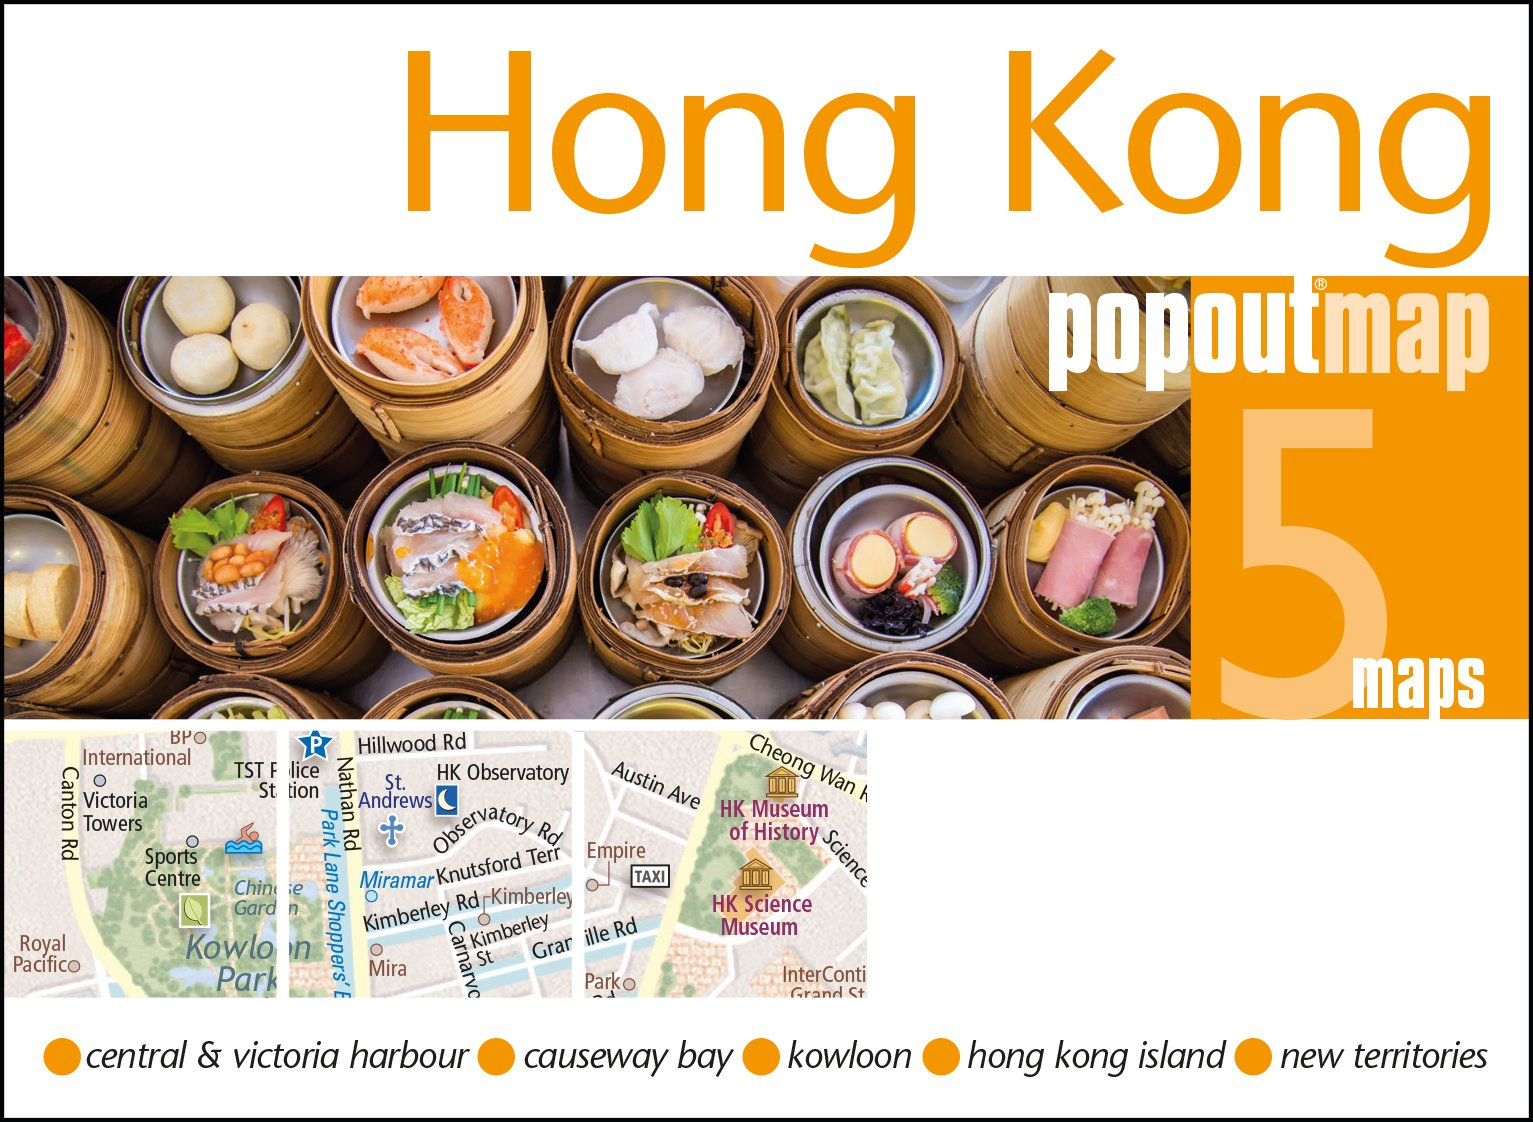 Hong Kong PopOut Map (PopOut Maps): PopOut Maps: 9781910218730 ... Kimberley Road Kowloon Map on christchurch new zealand map, wong tai sin map, new territories map, kai tak airport map, causeway bay map, wan chai map, hong kong map, tsim tsa tsui map, china map, tsim sha tsui map, south korea map, london map, the gateway map, hk map, india map, toronto map, tuen mun map, macau map, tsuen wan map,